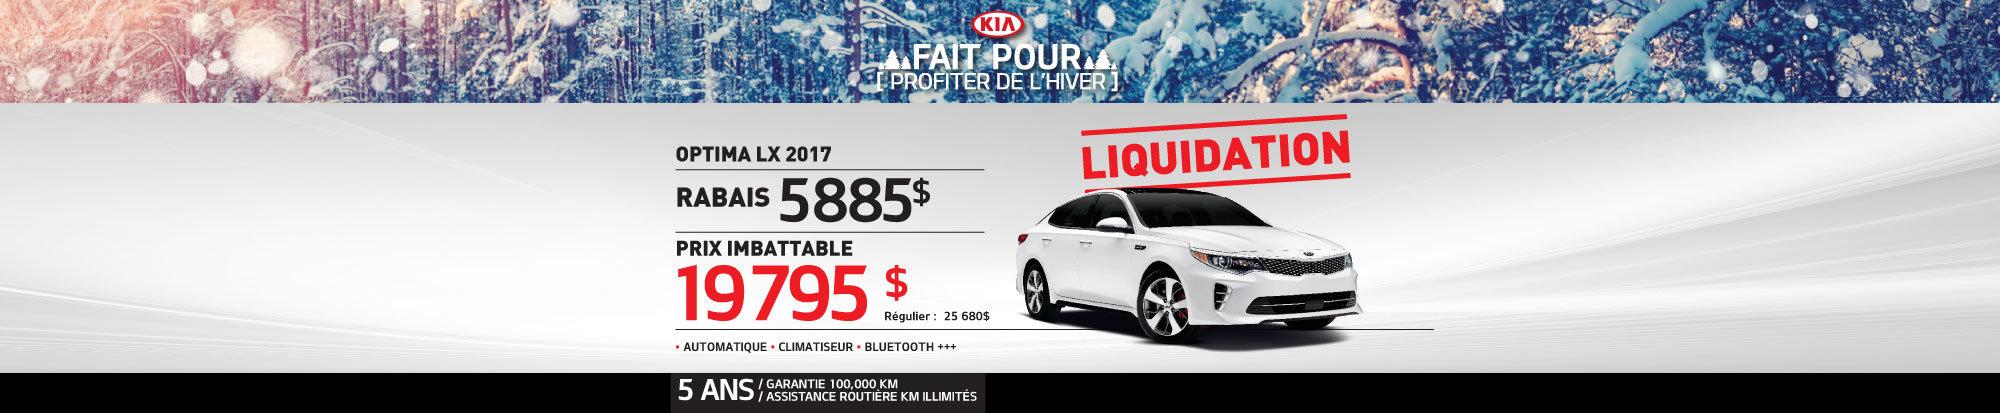 Liquidation Optima 2017 web